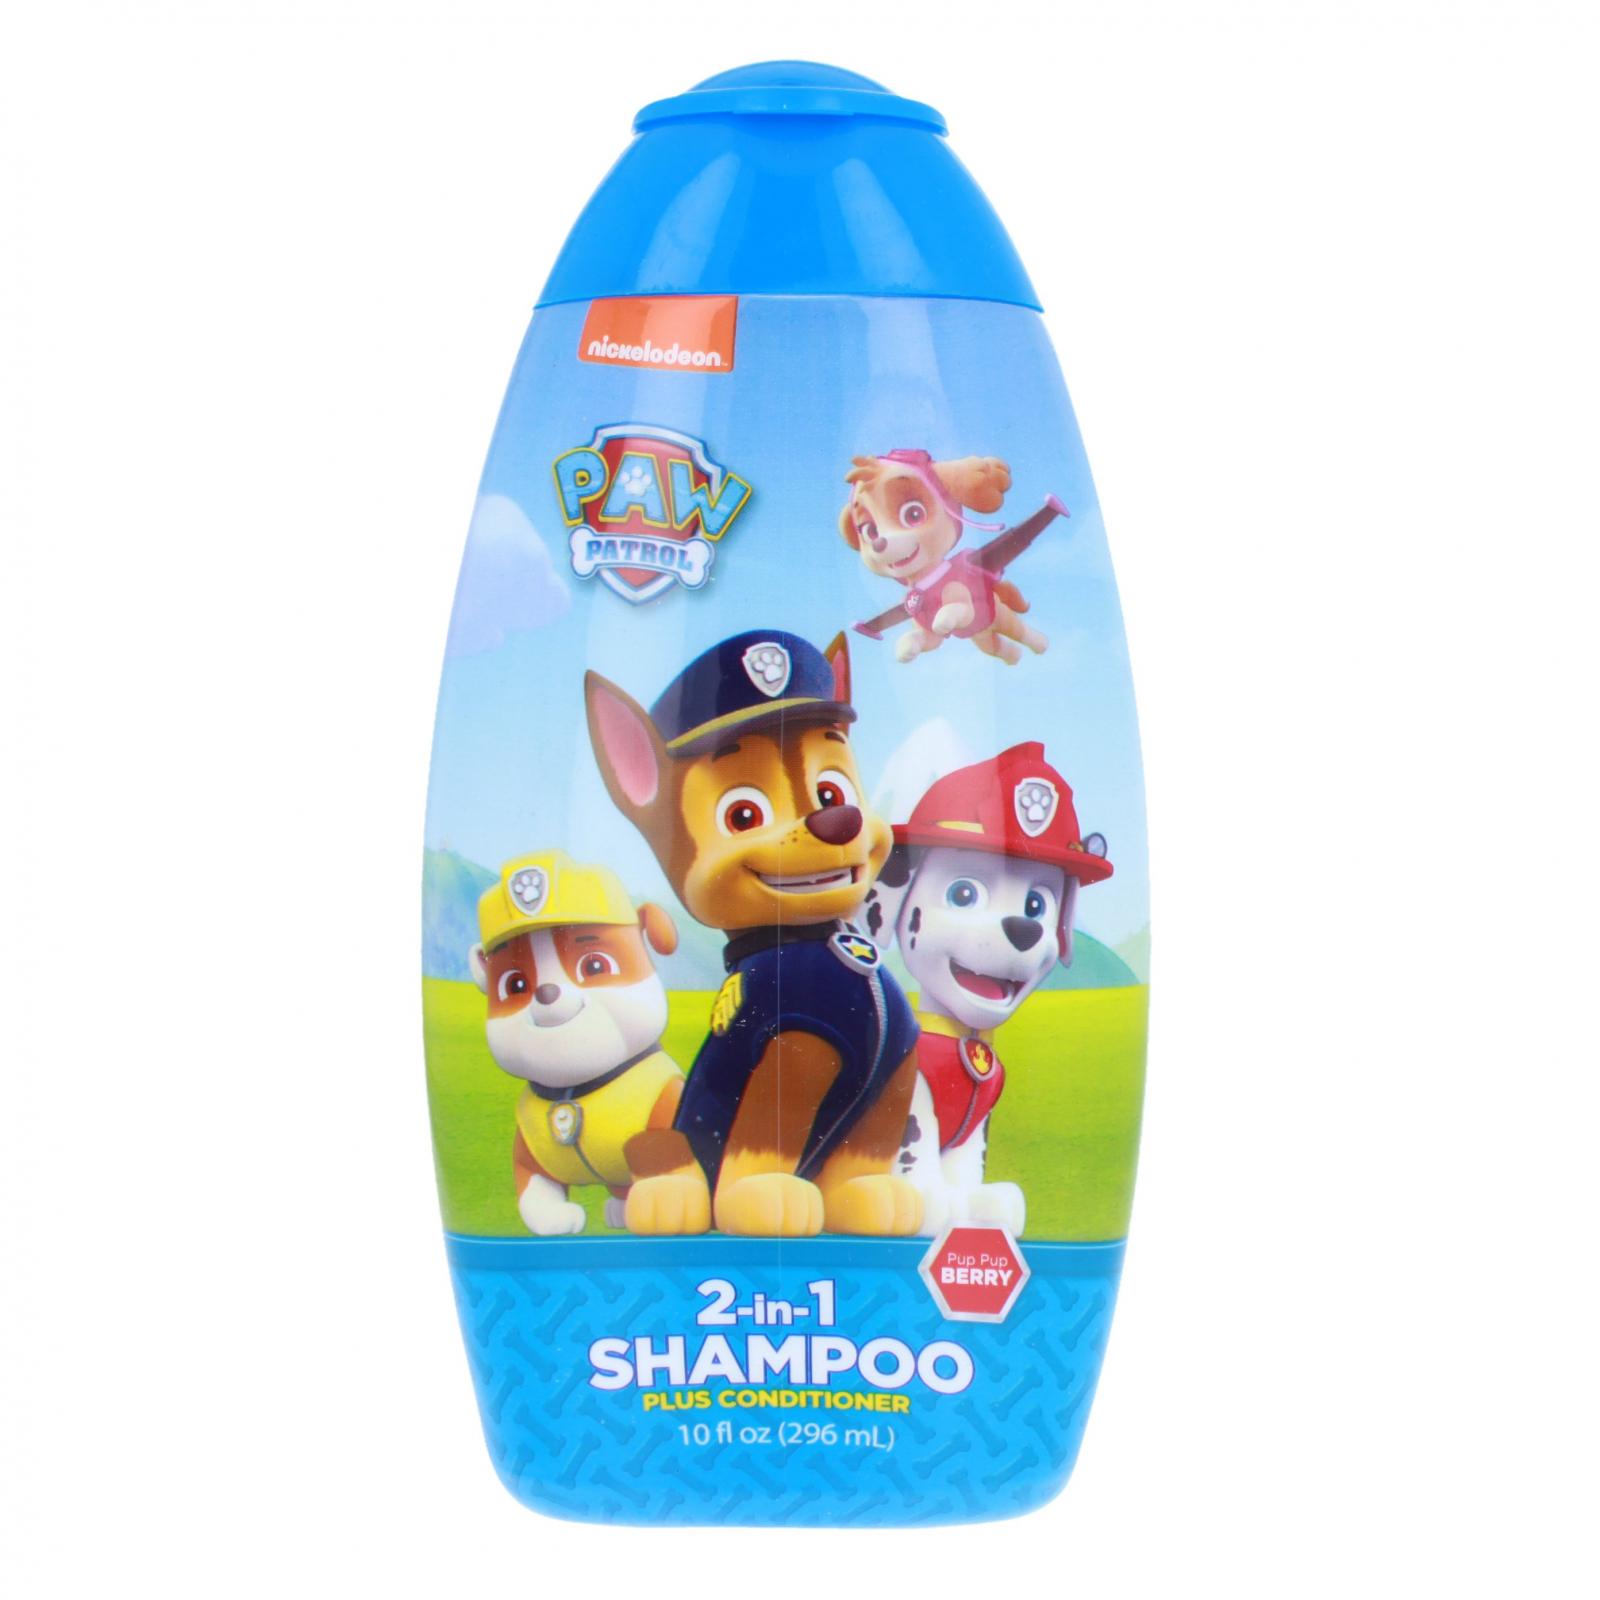 Paw Patrol Childrens 2 in 1 Shampoo Conditioner 10oz Bottle